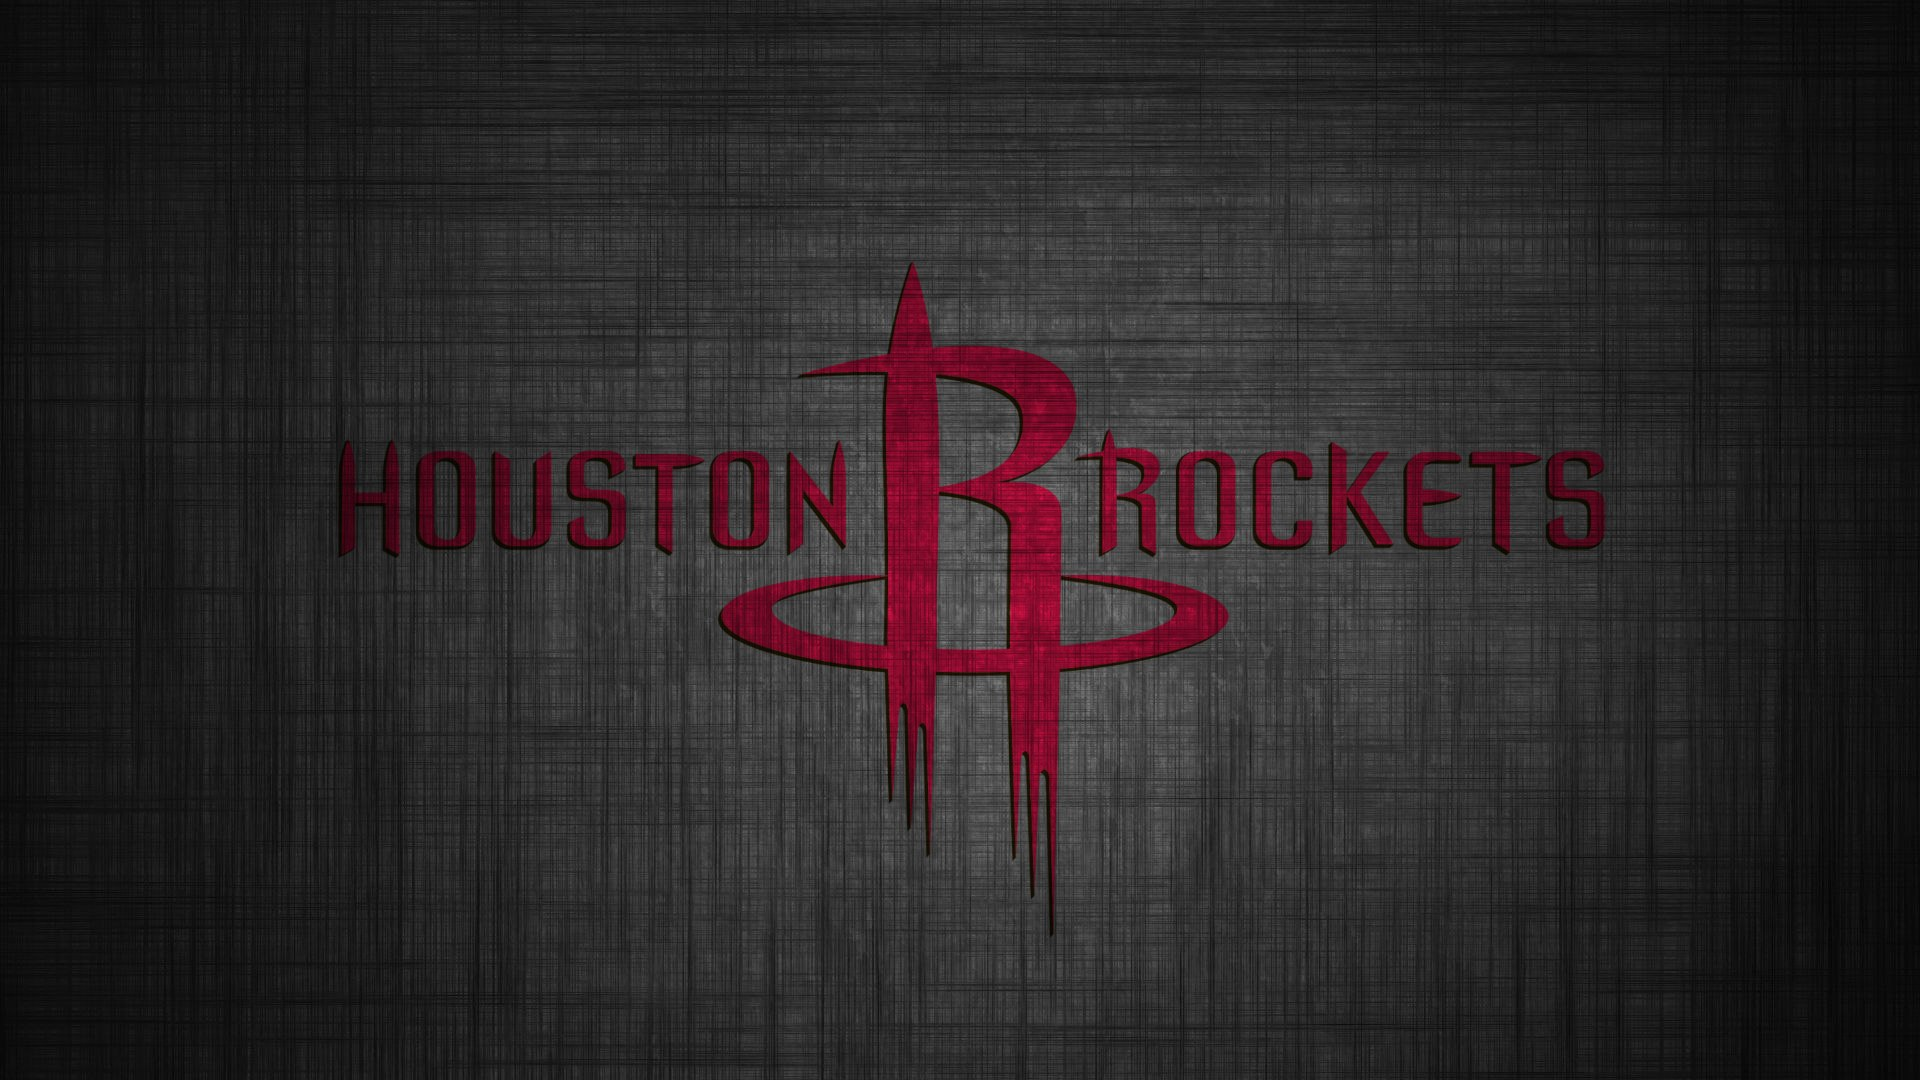 hd houston rockets backgrounds